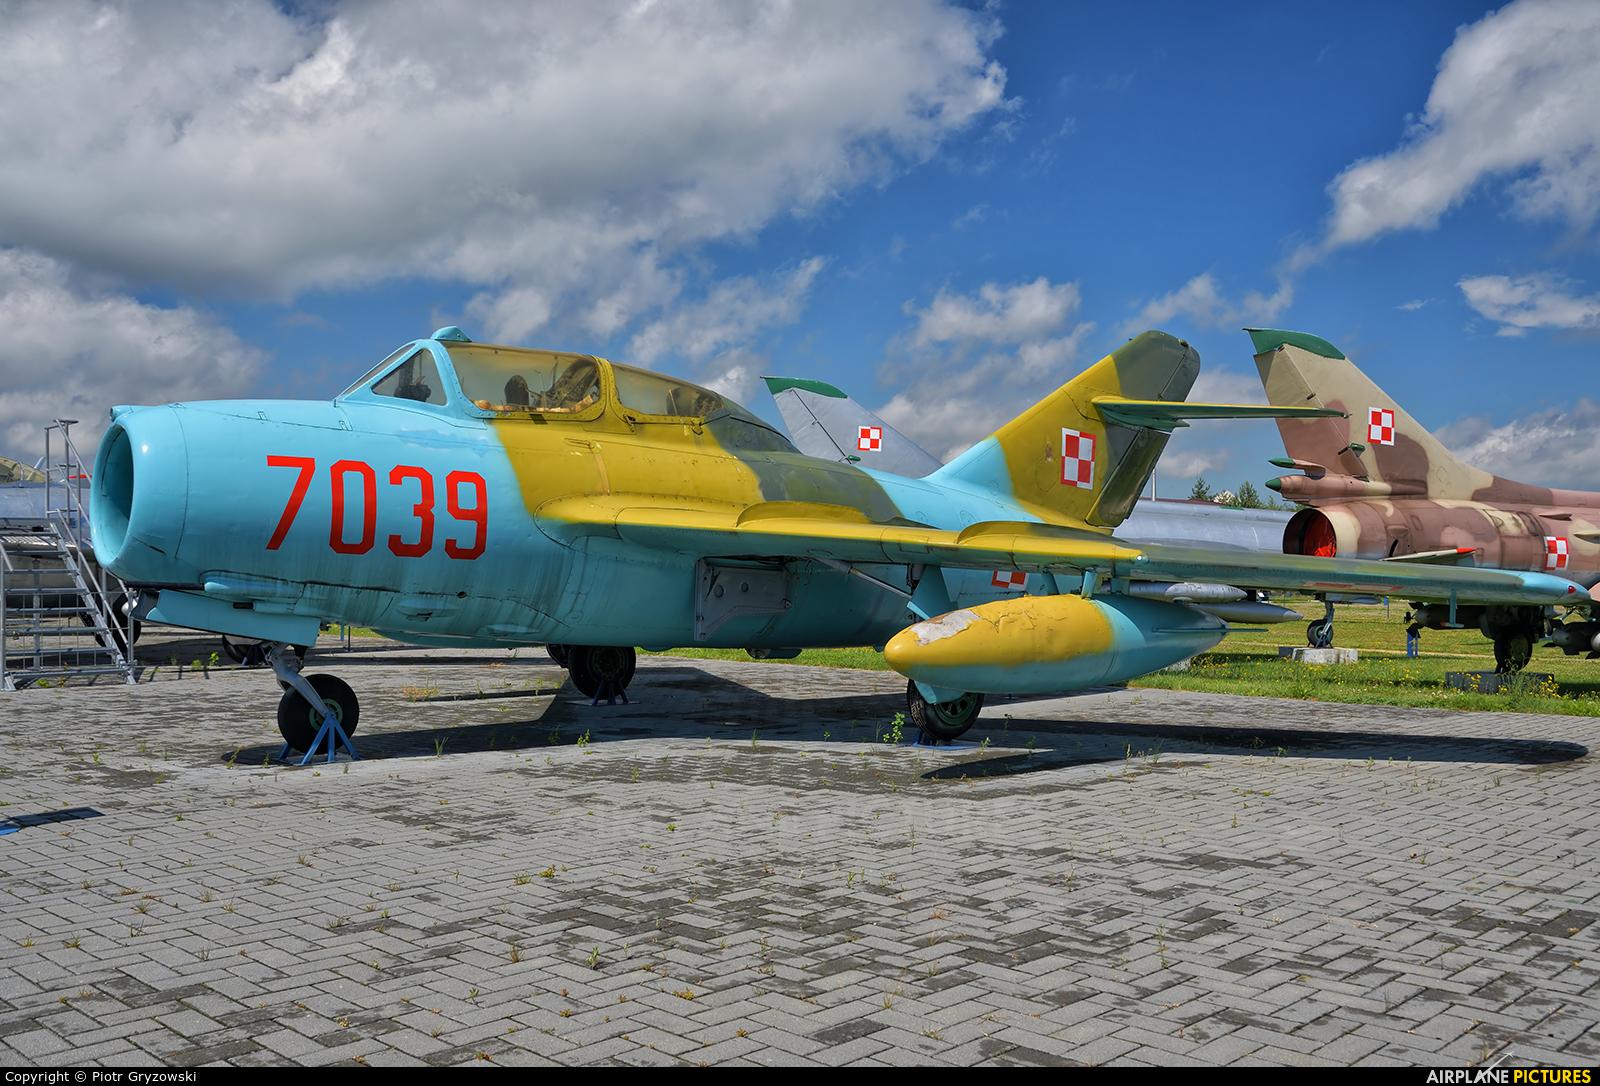 Poland - Navy 7039 aircraft at Dęblin - Museum of Polish Air Force